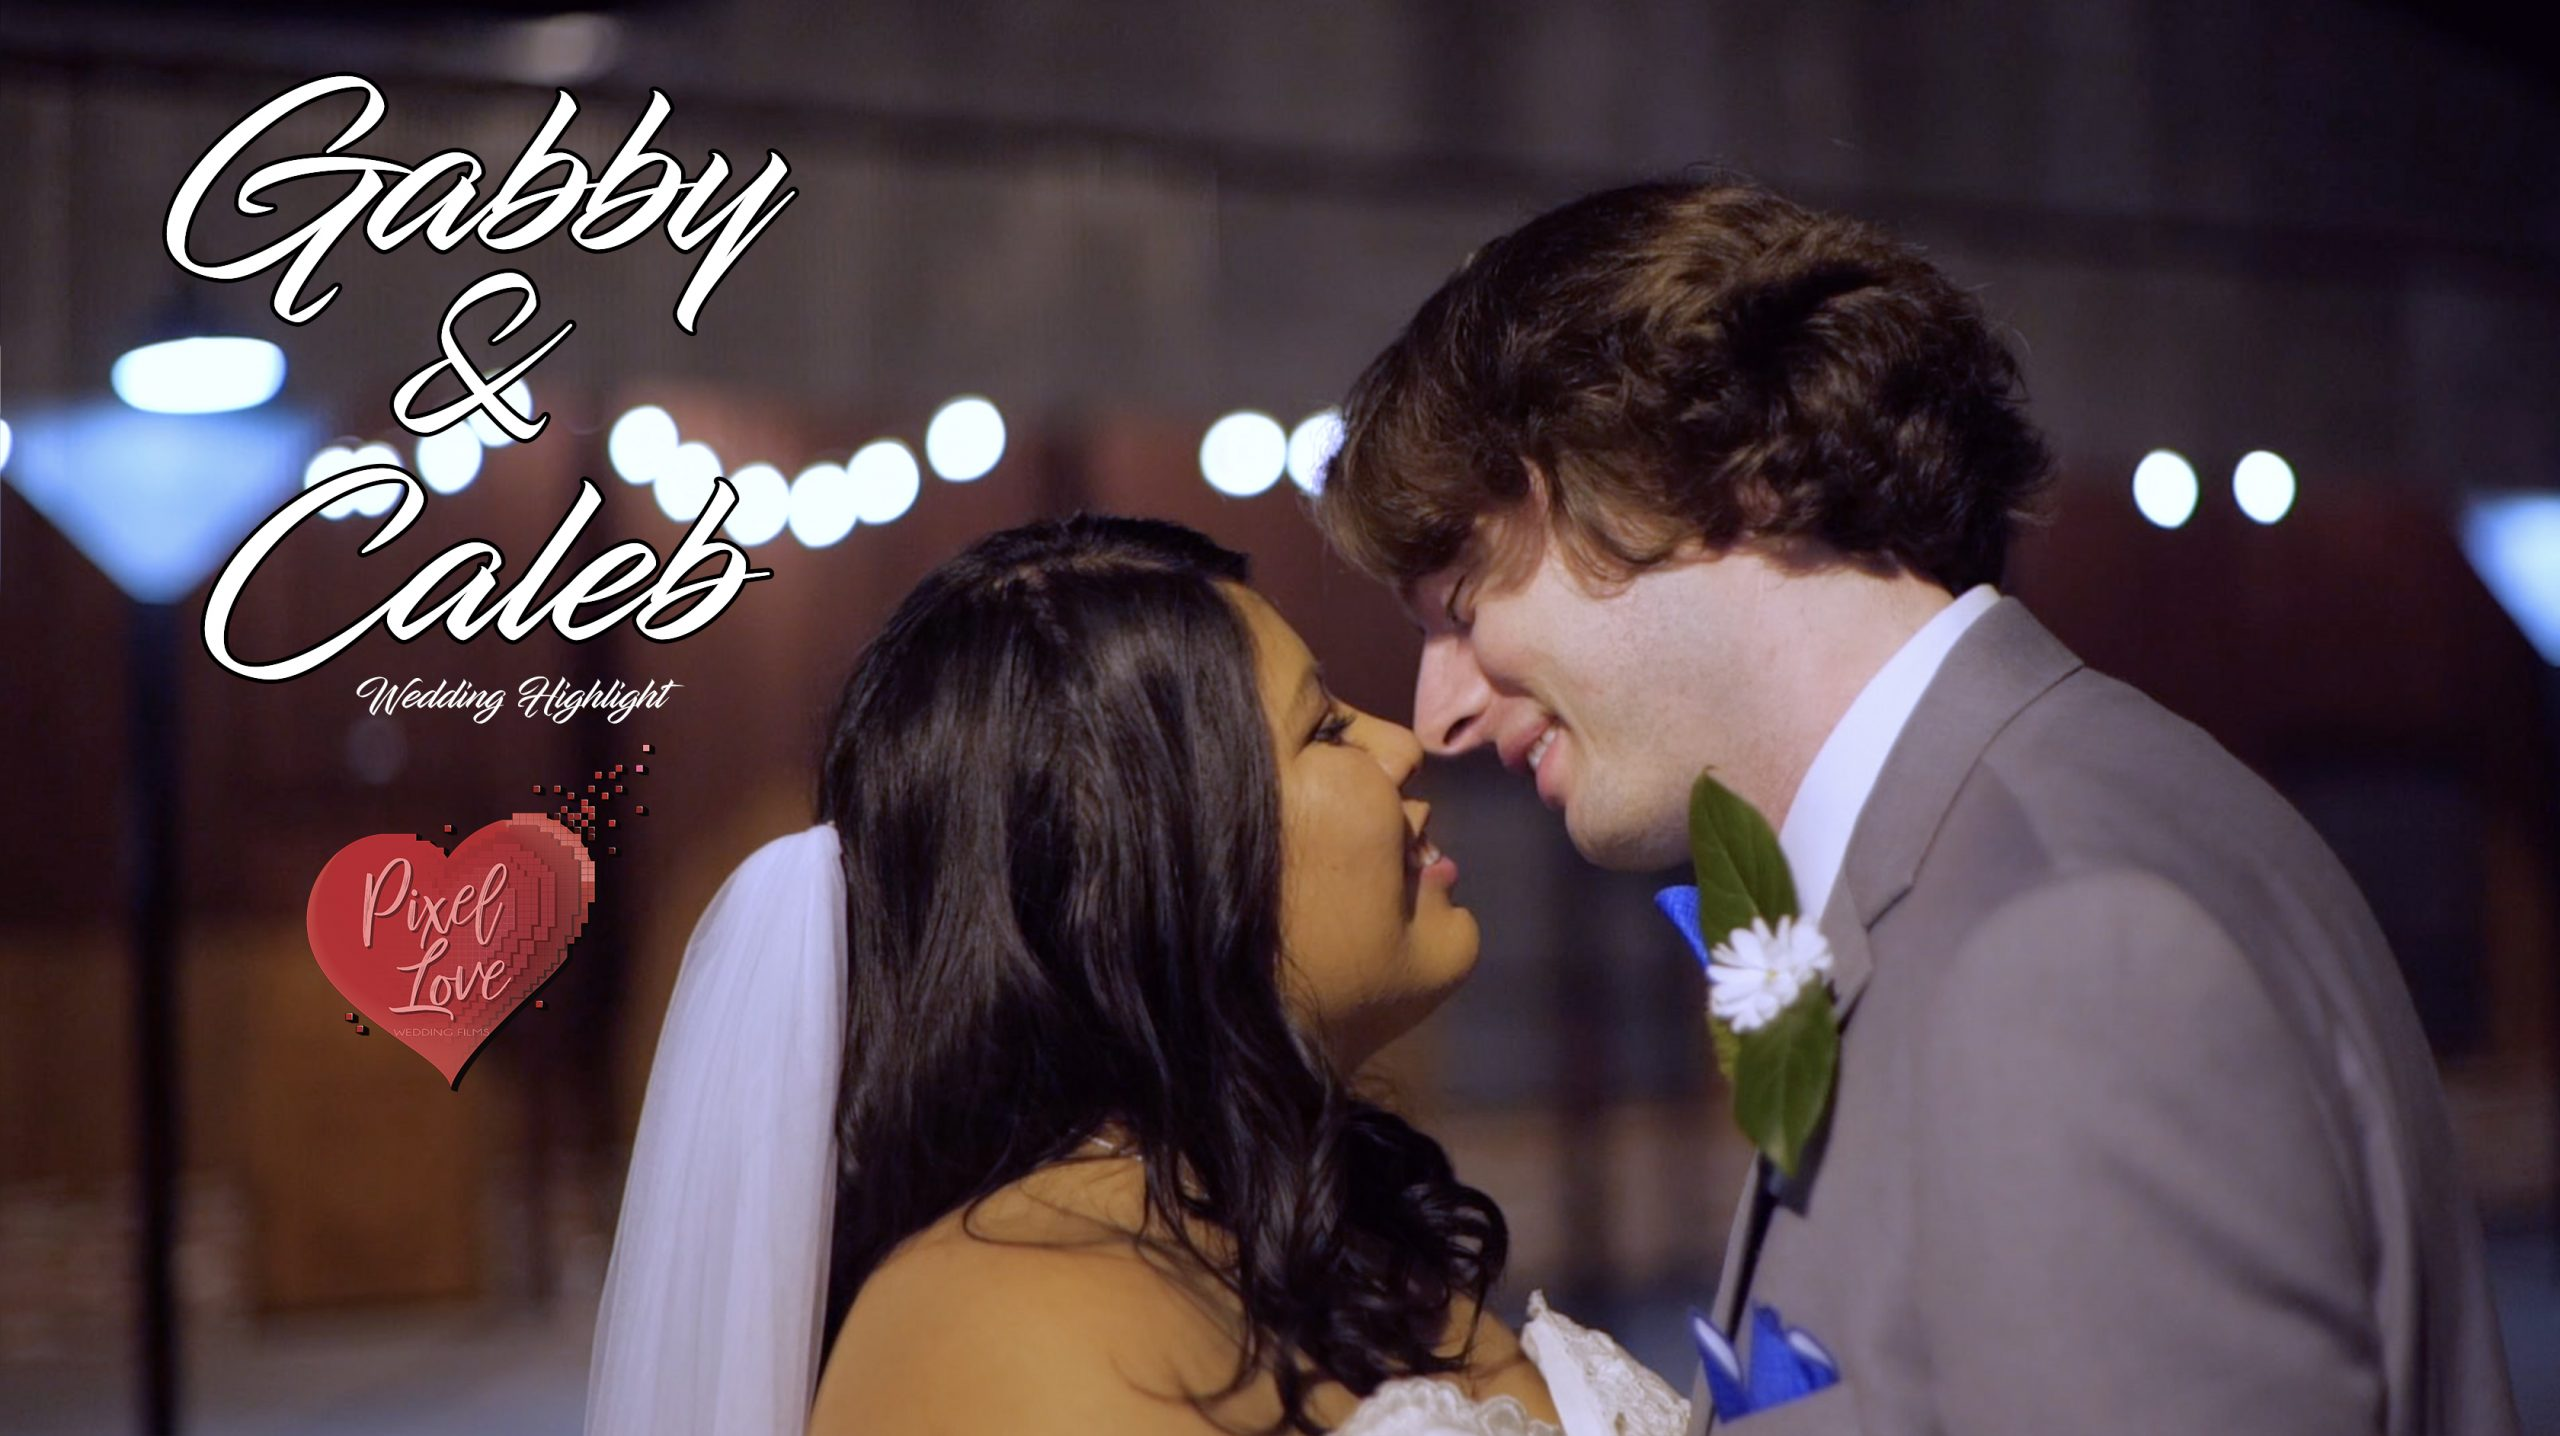 Gabby & Caleb – Wedding at The Gin at Nesbit